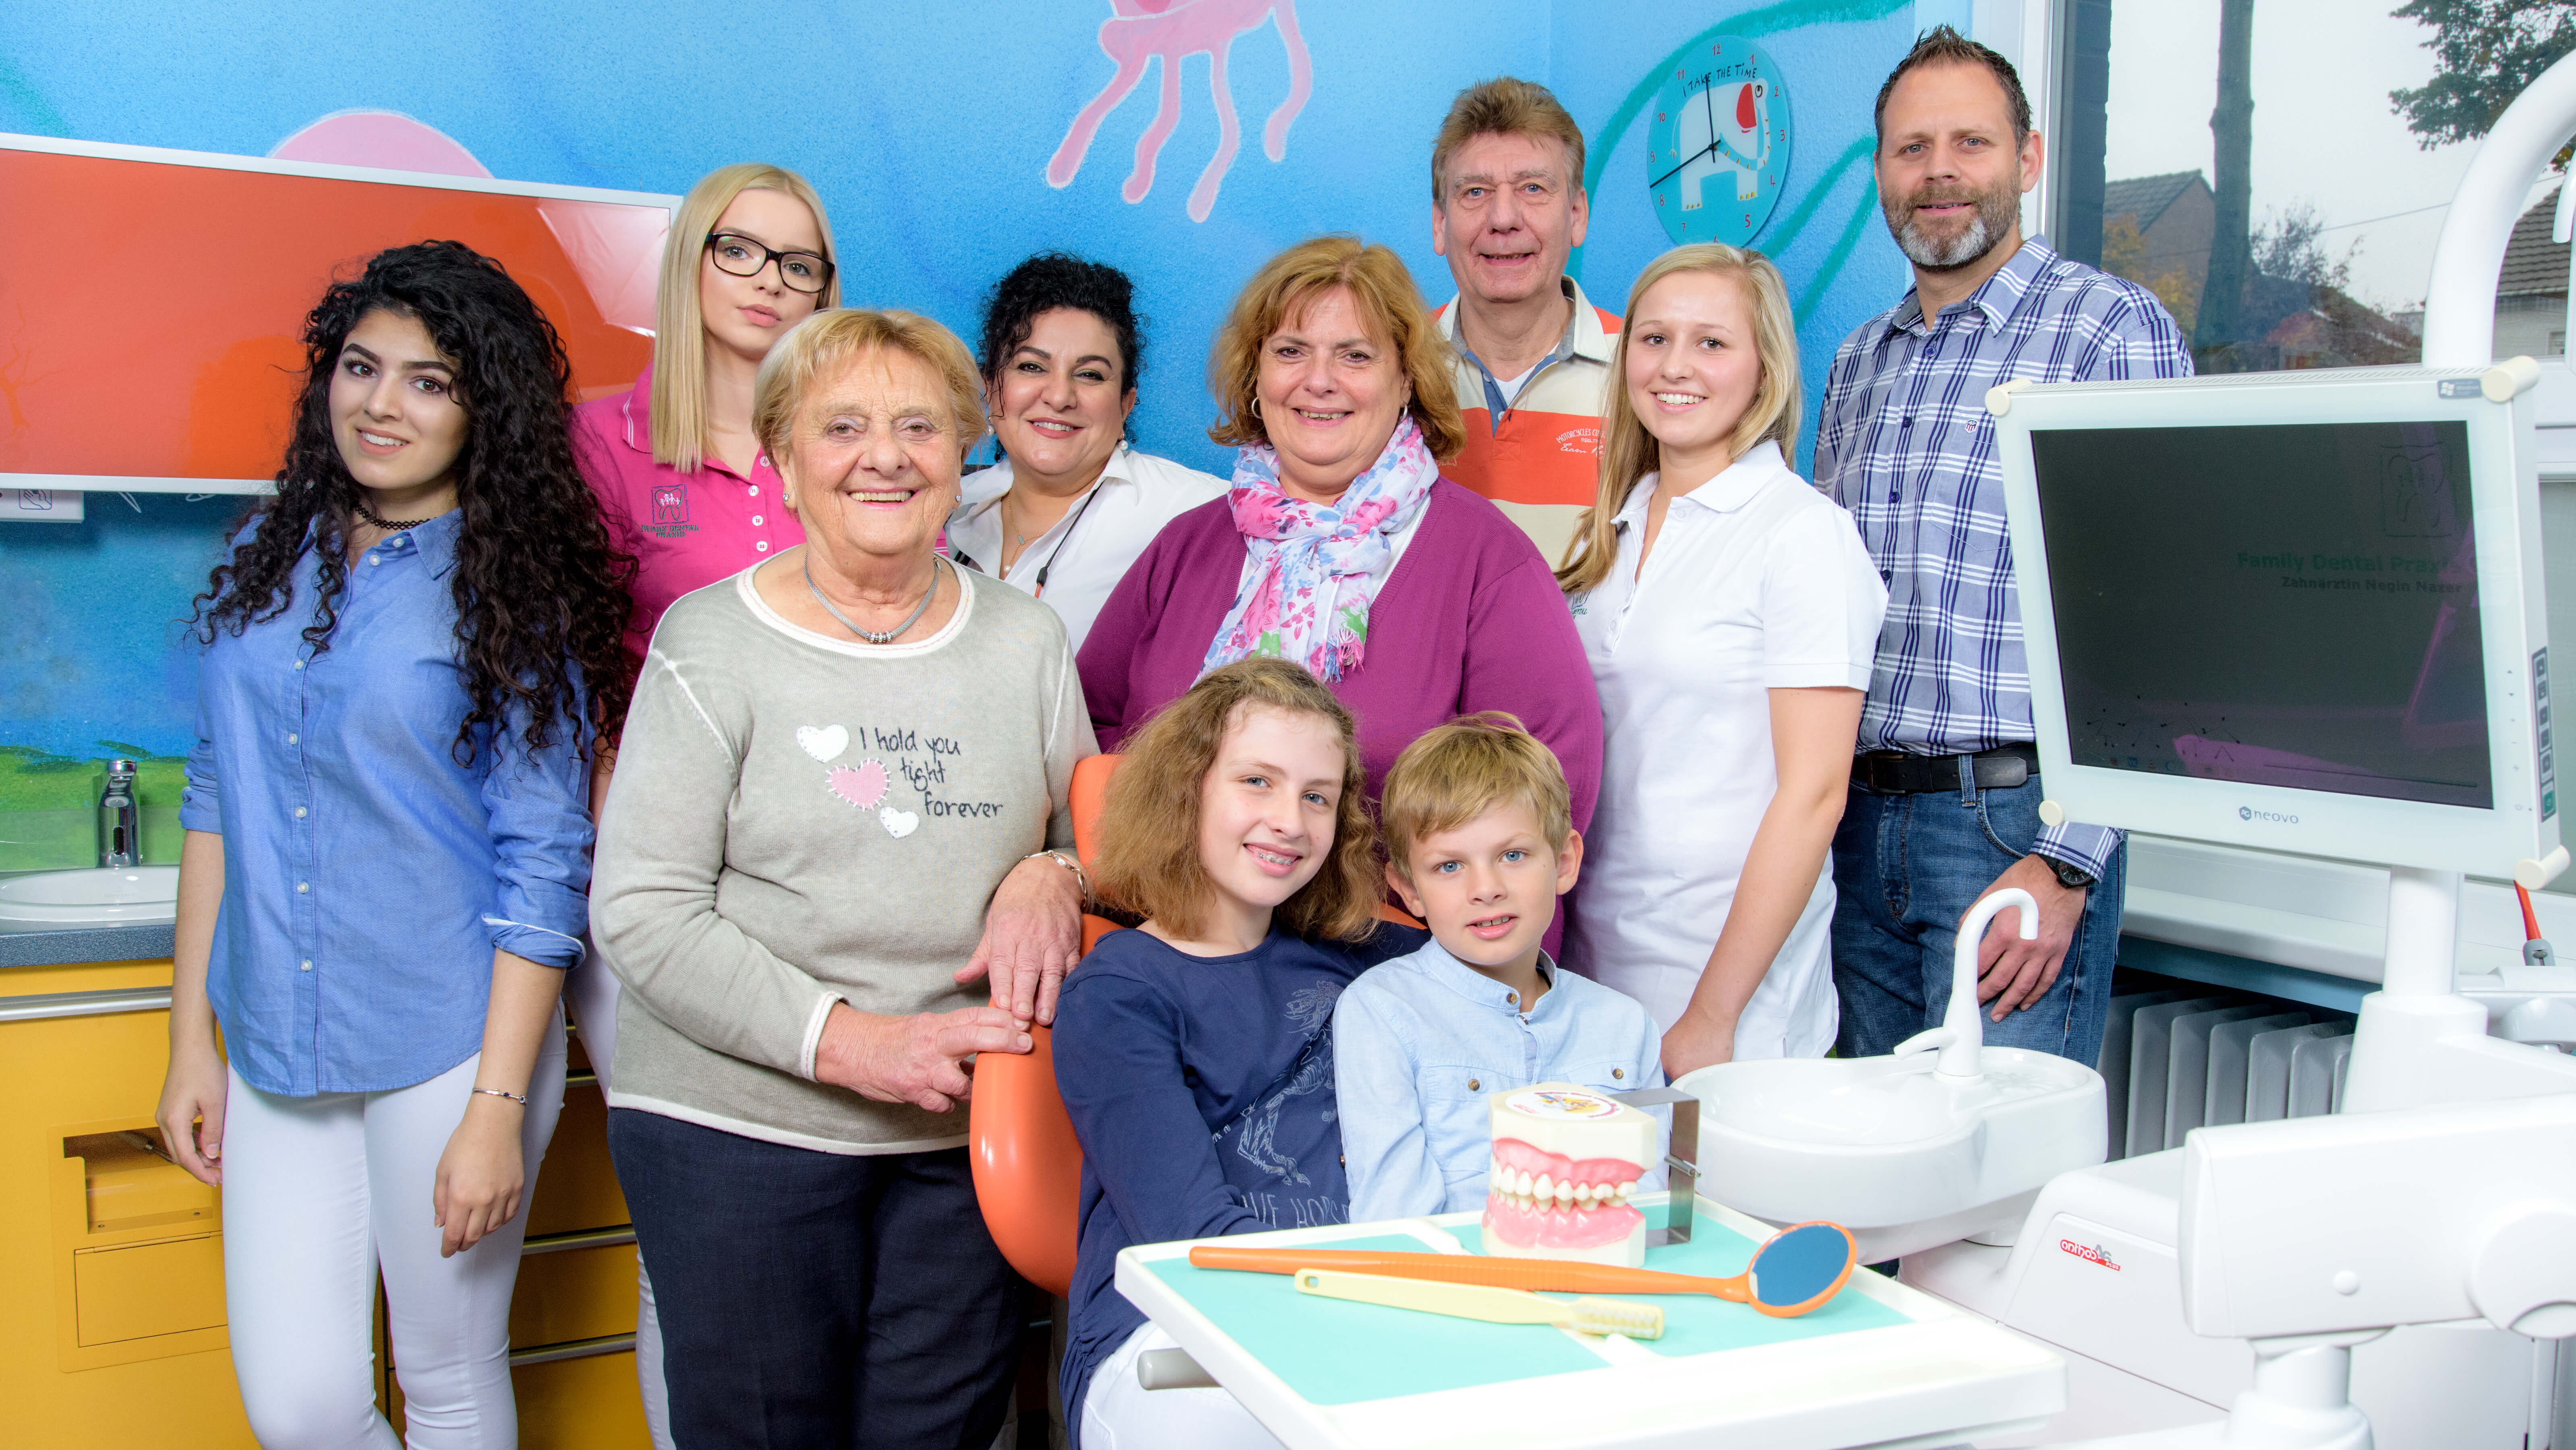 Zahnarzt Meerbusch, Praxis Negin Nazer, Teamfoto mit Patienten